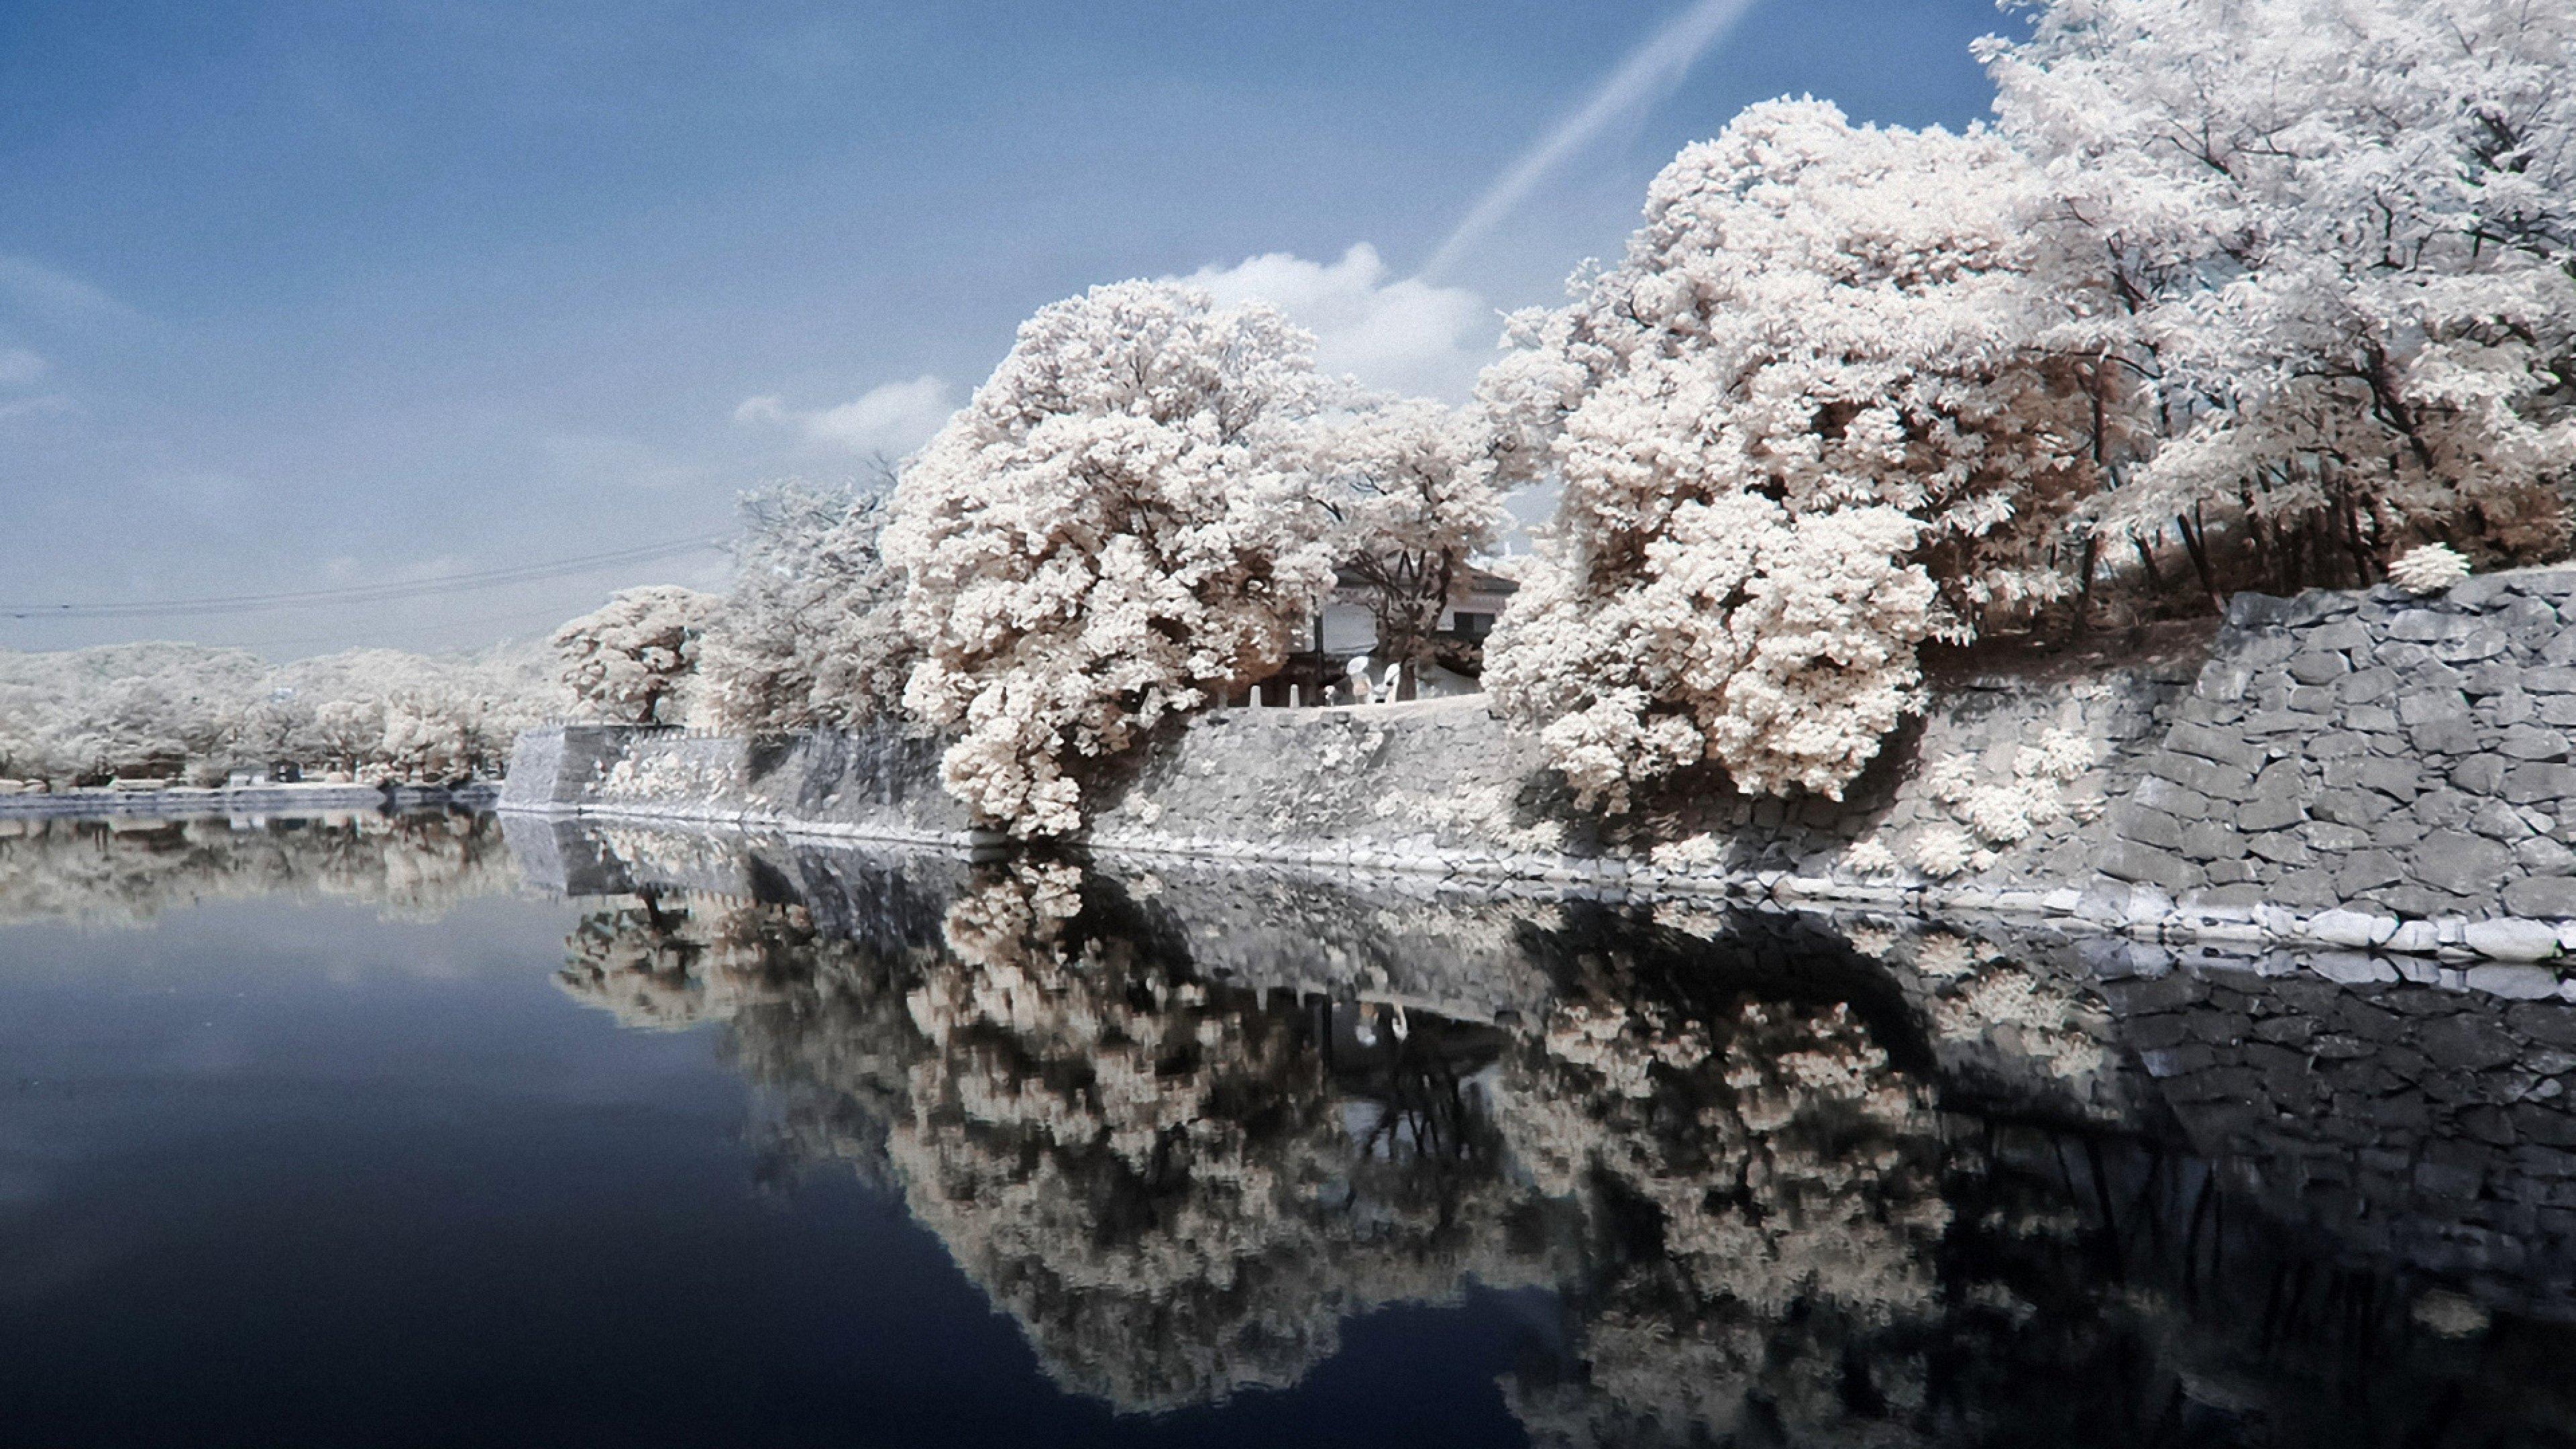 3840x2160 Wallpaper japan coast river stone trees landscape sky 3840x2160